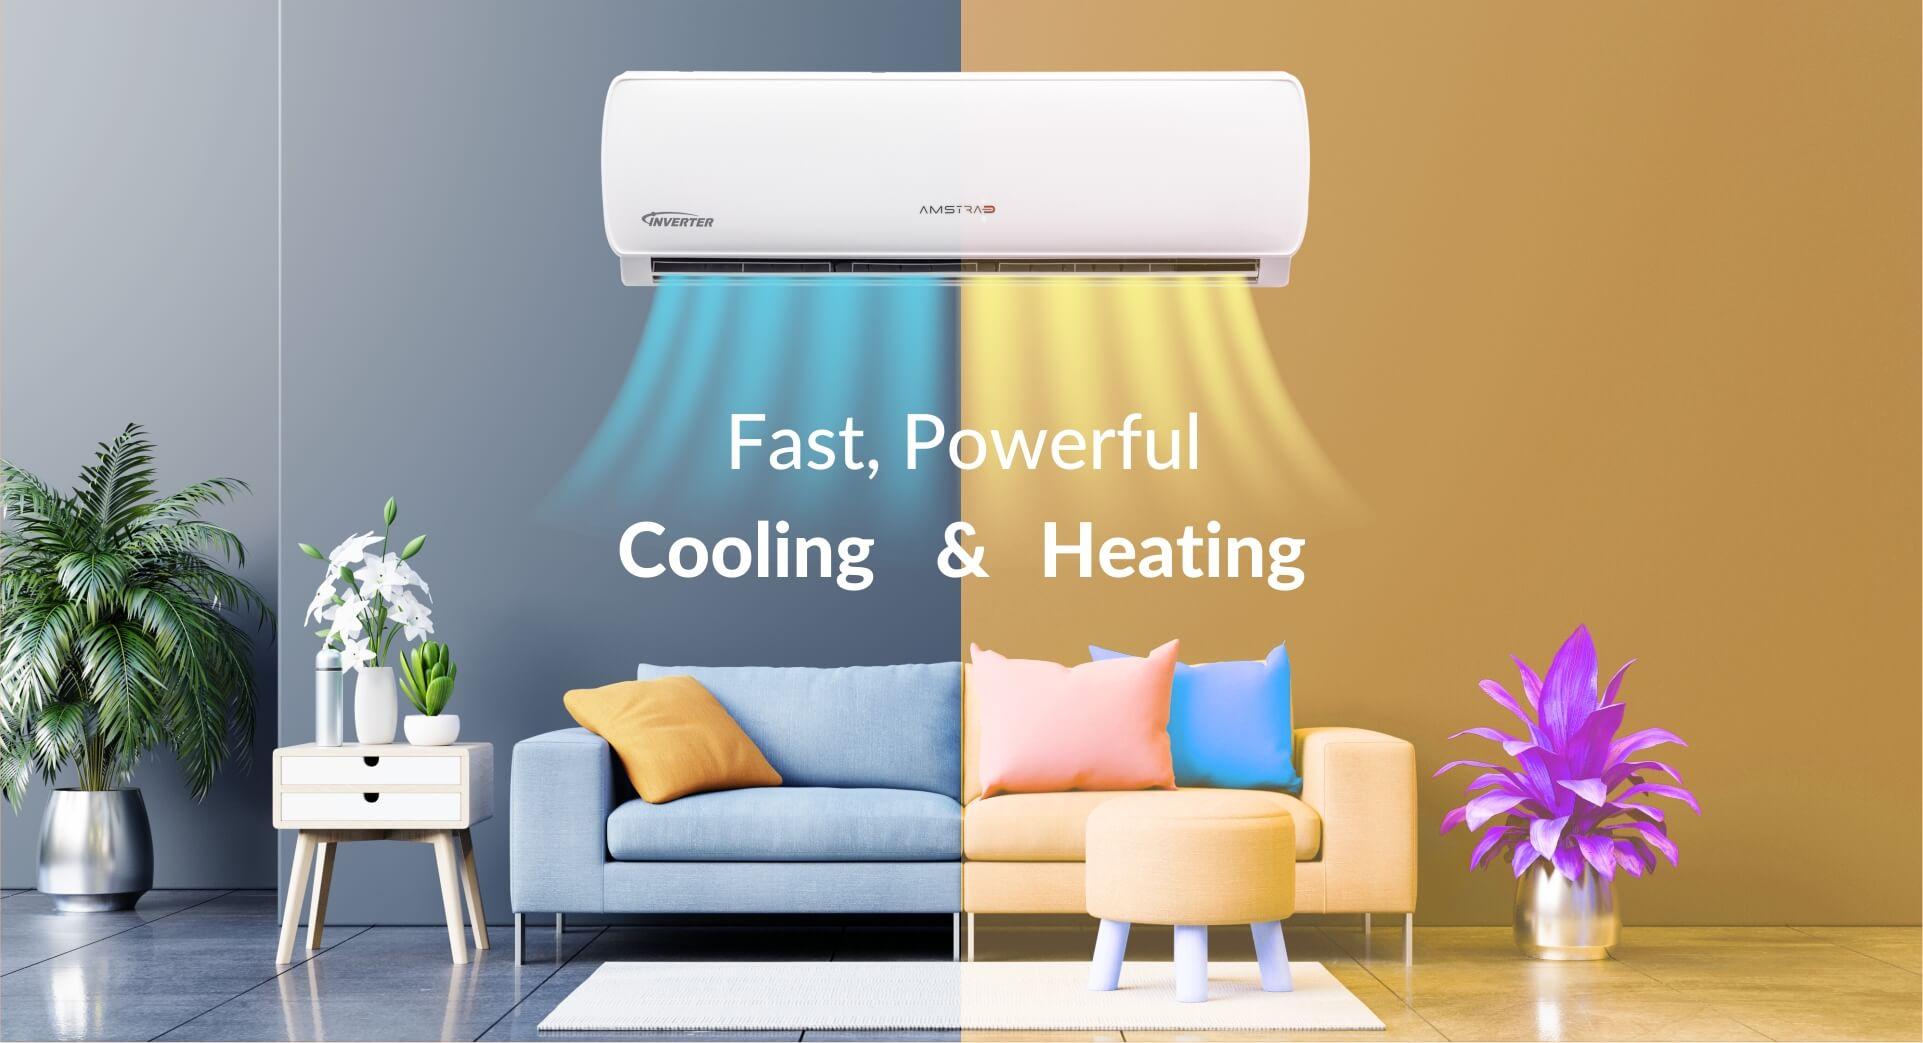 Amstrad-Hot-Cold-All-Season-AC